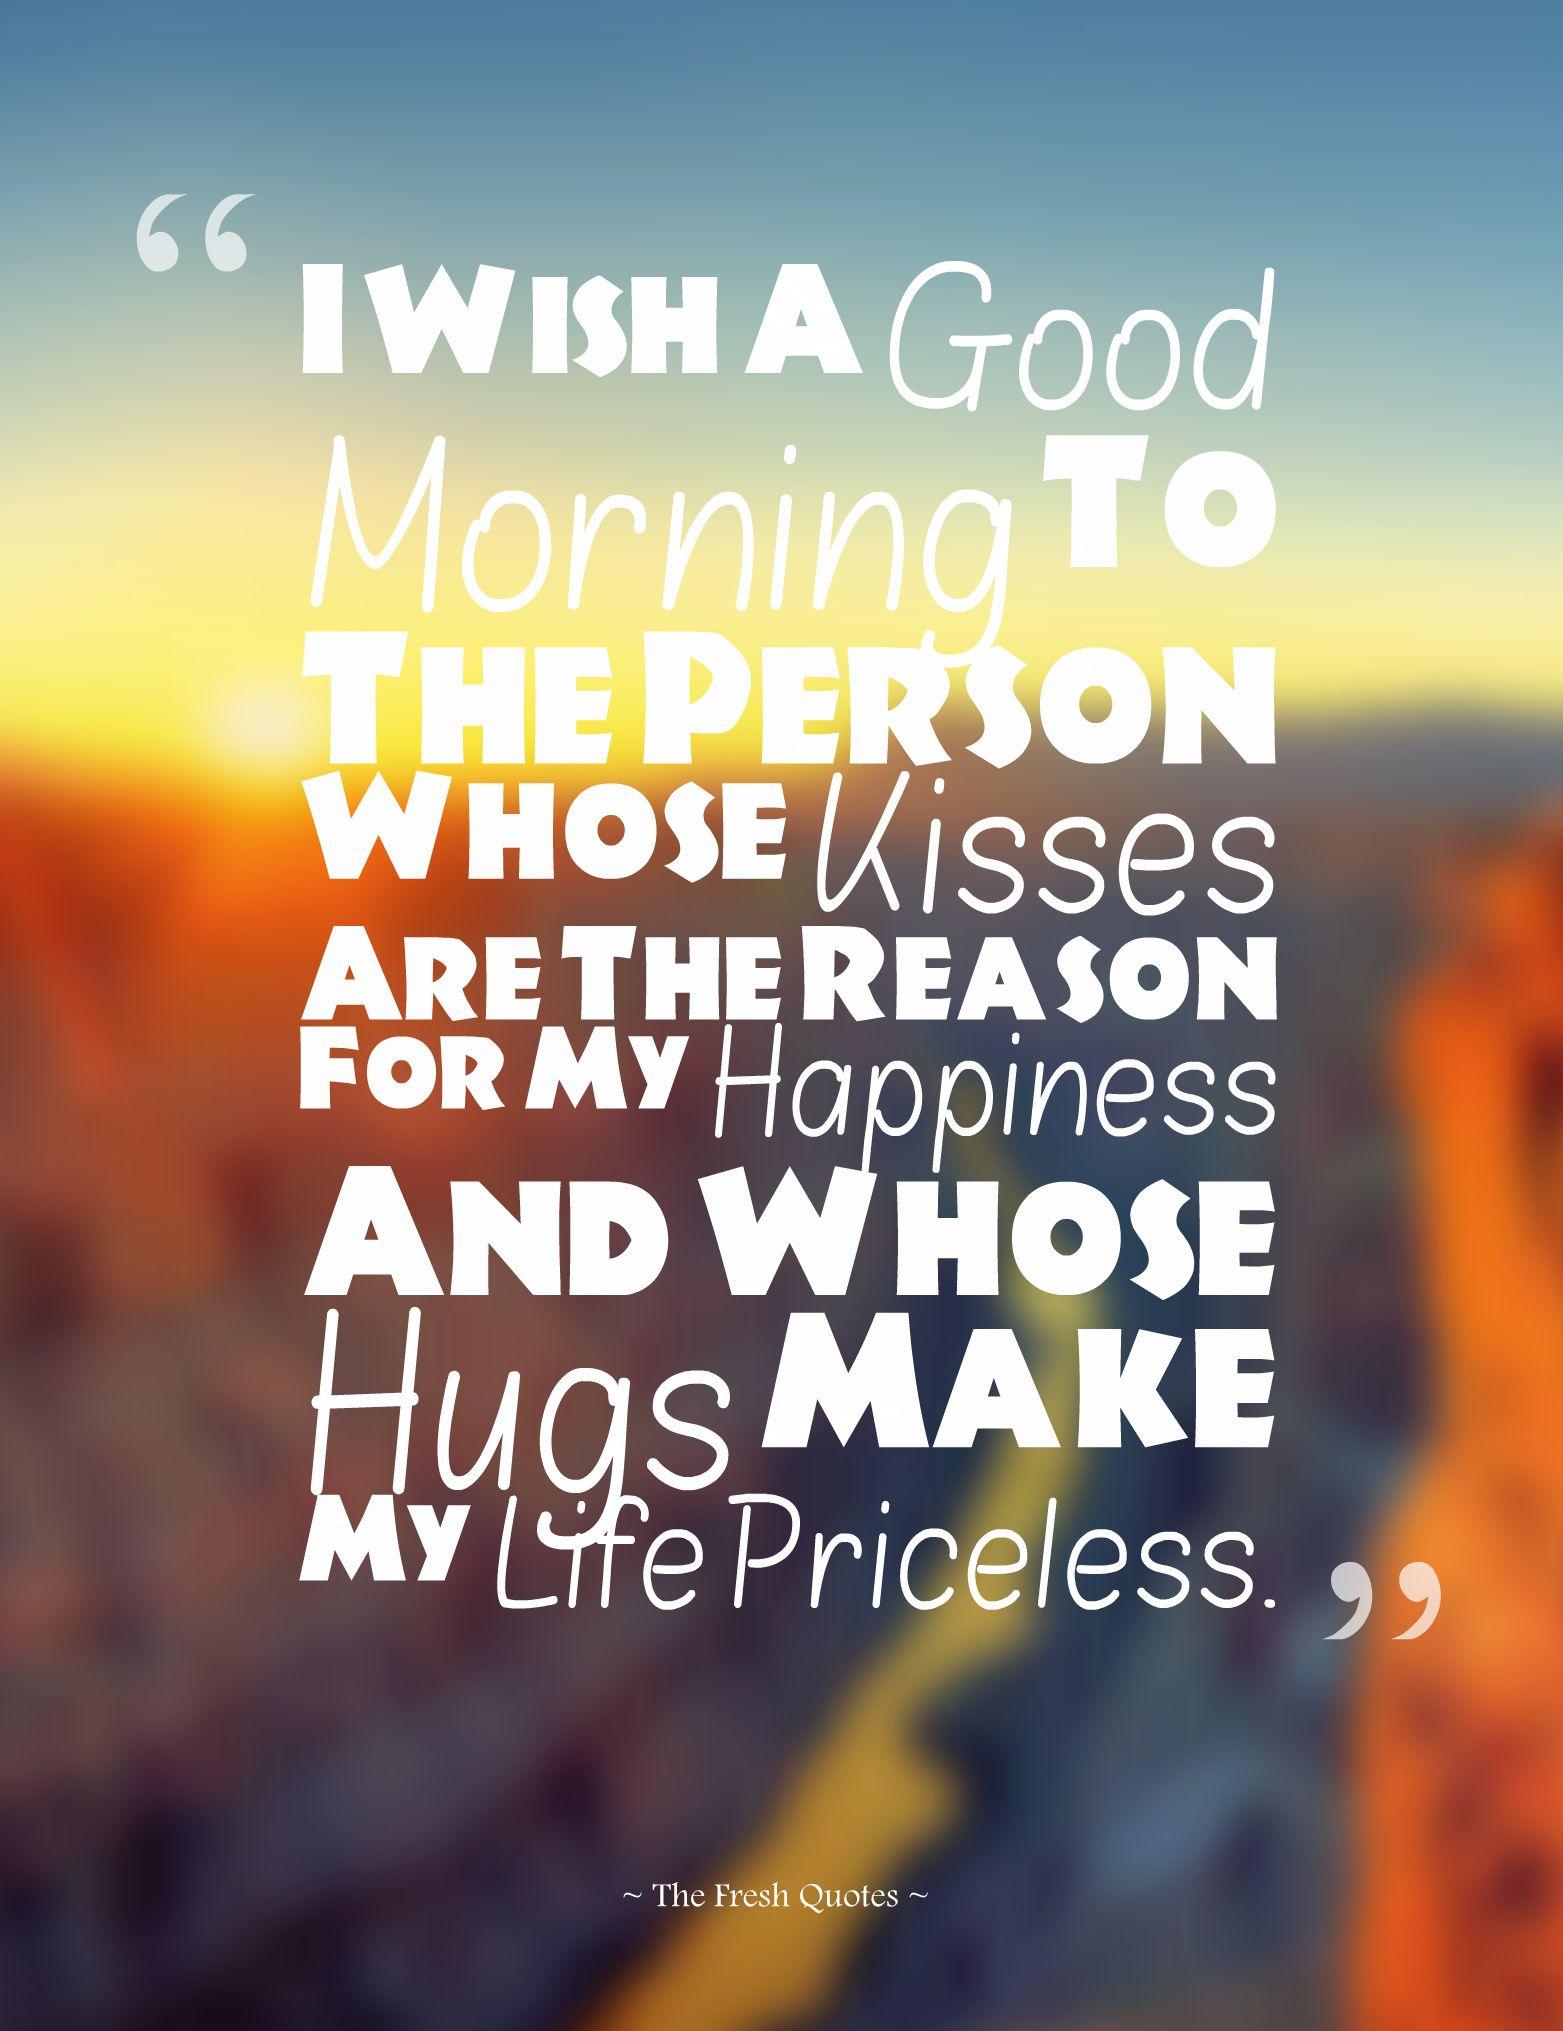 Good Morning Boyfriend Pic : Romantic good morning wishes girlfriend boyfriend him her